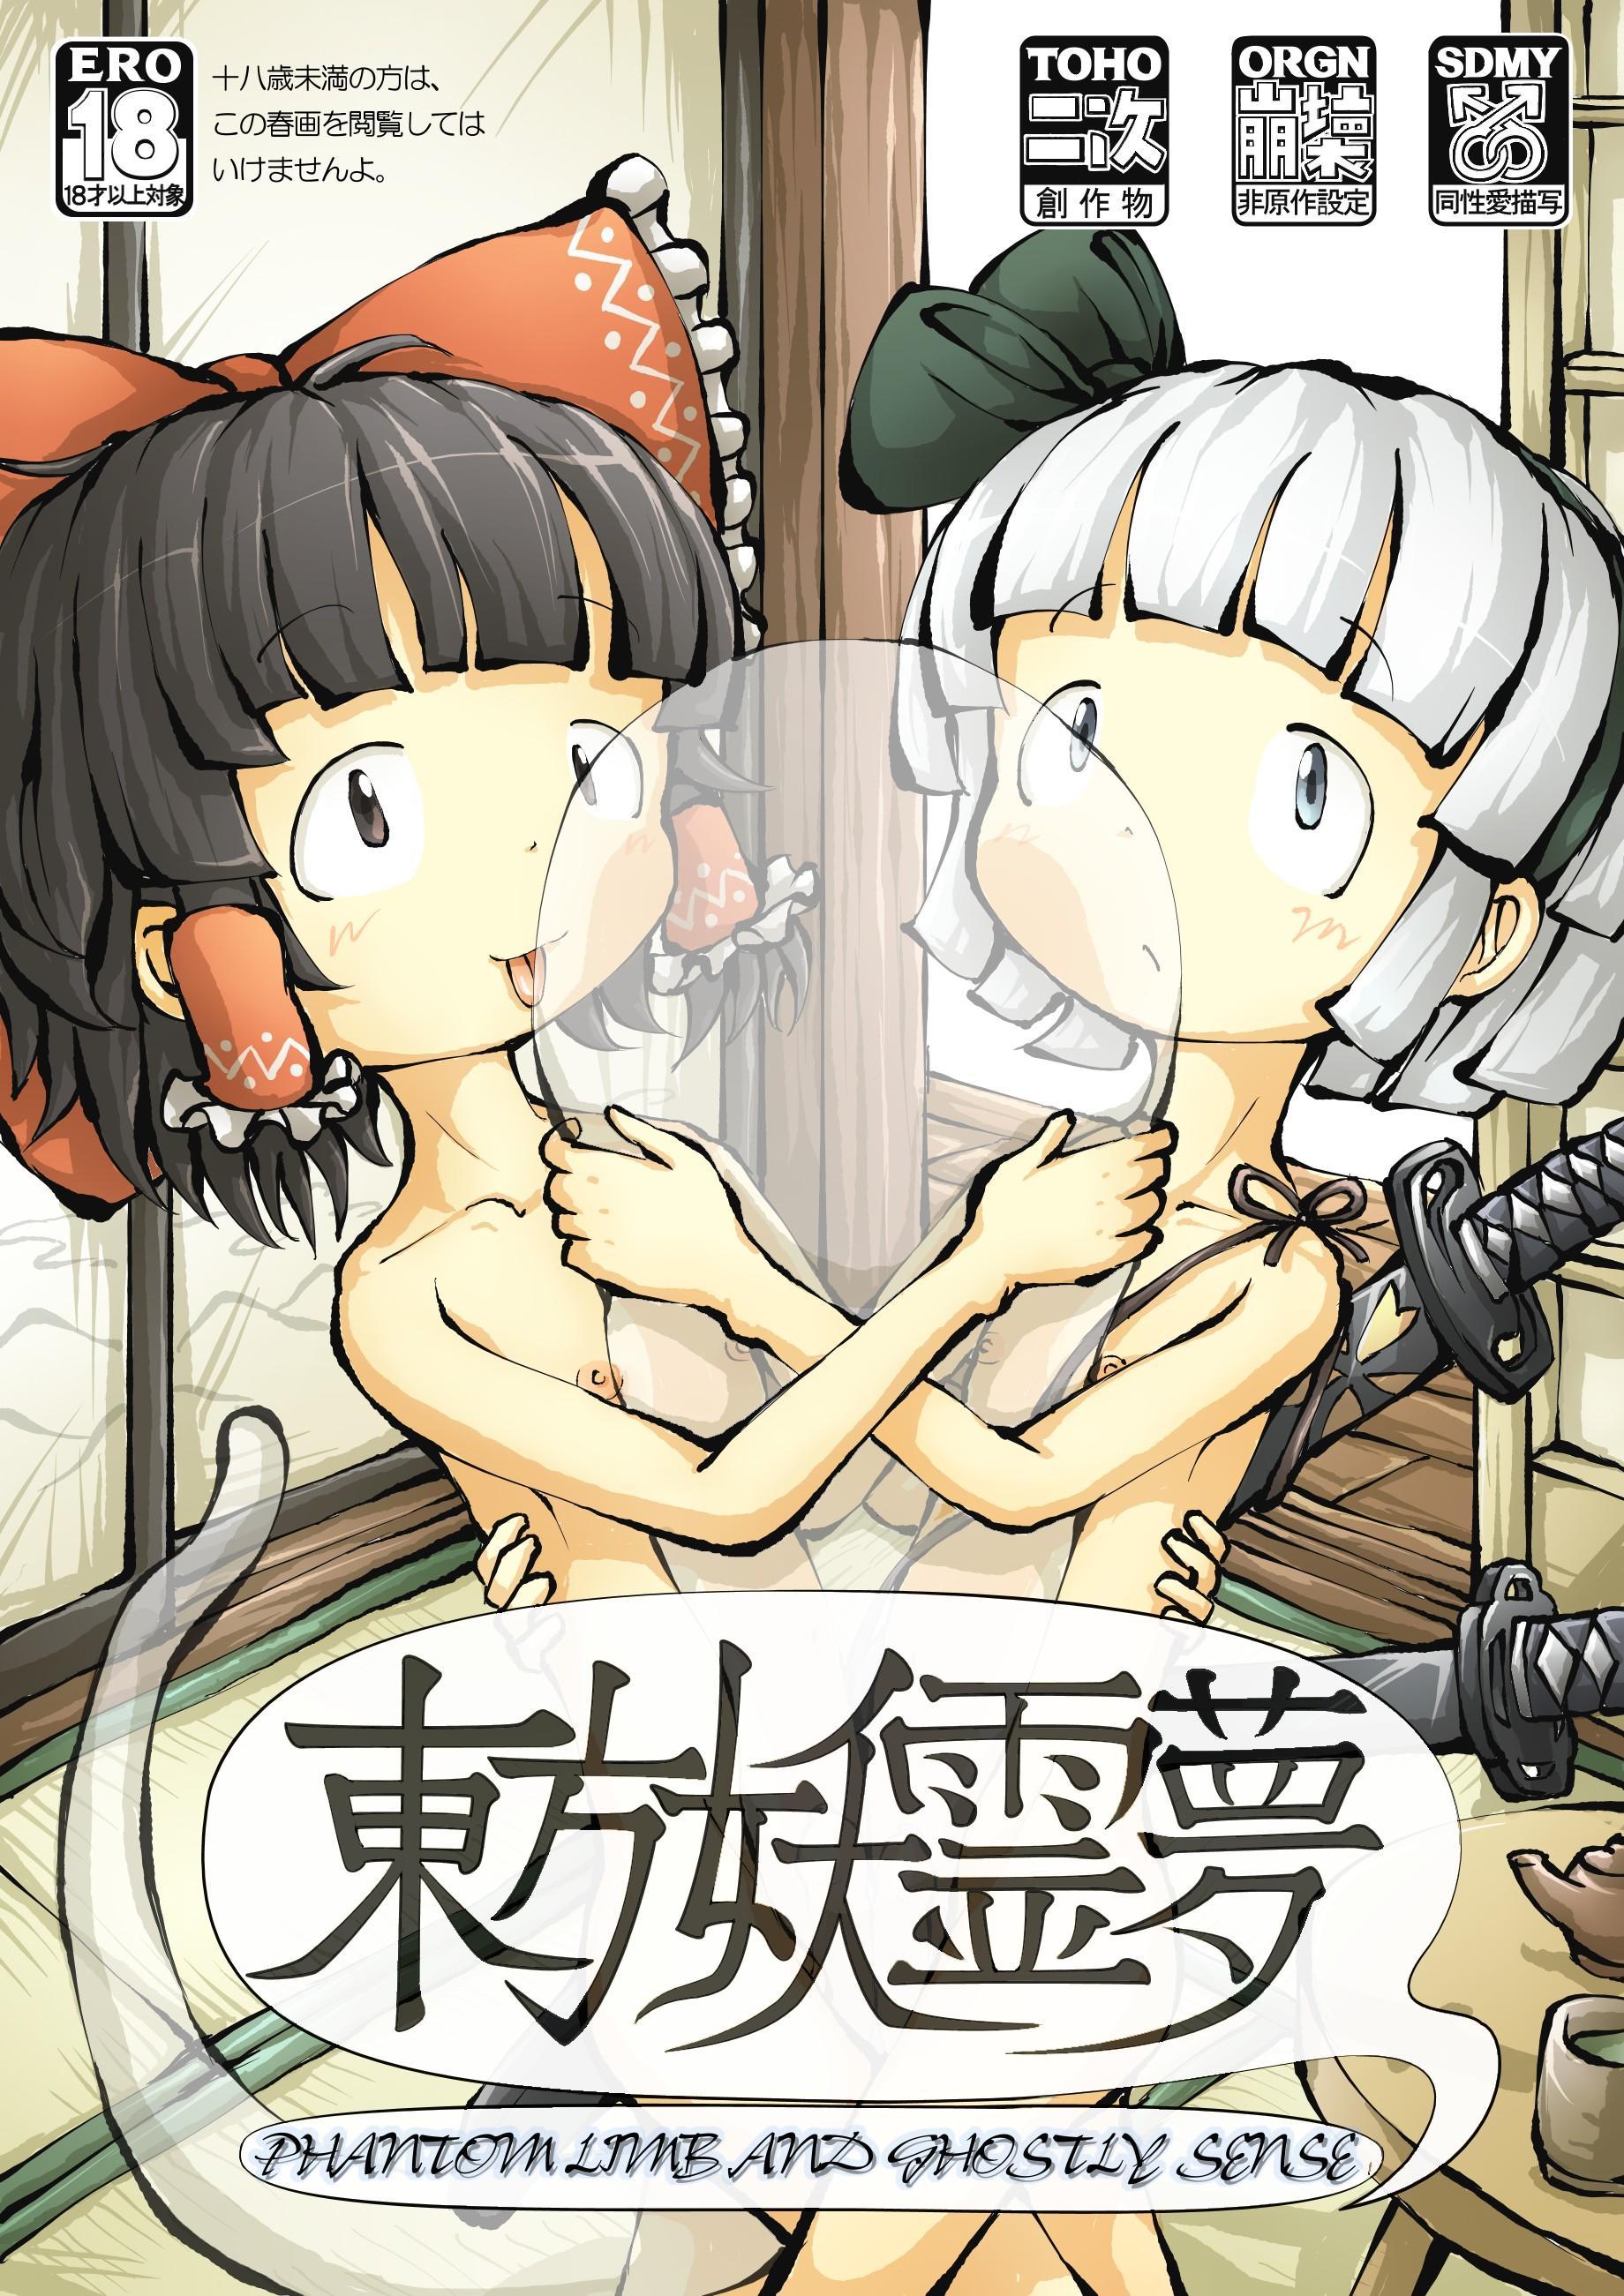 Touhou YouReimu – Phantom Limb and Ghostly Sense 0